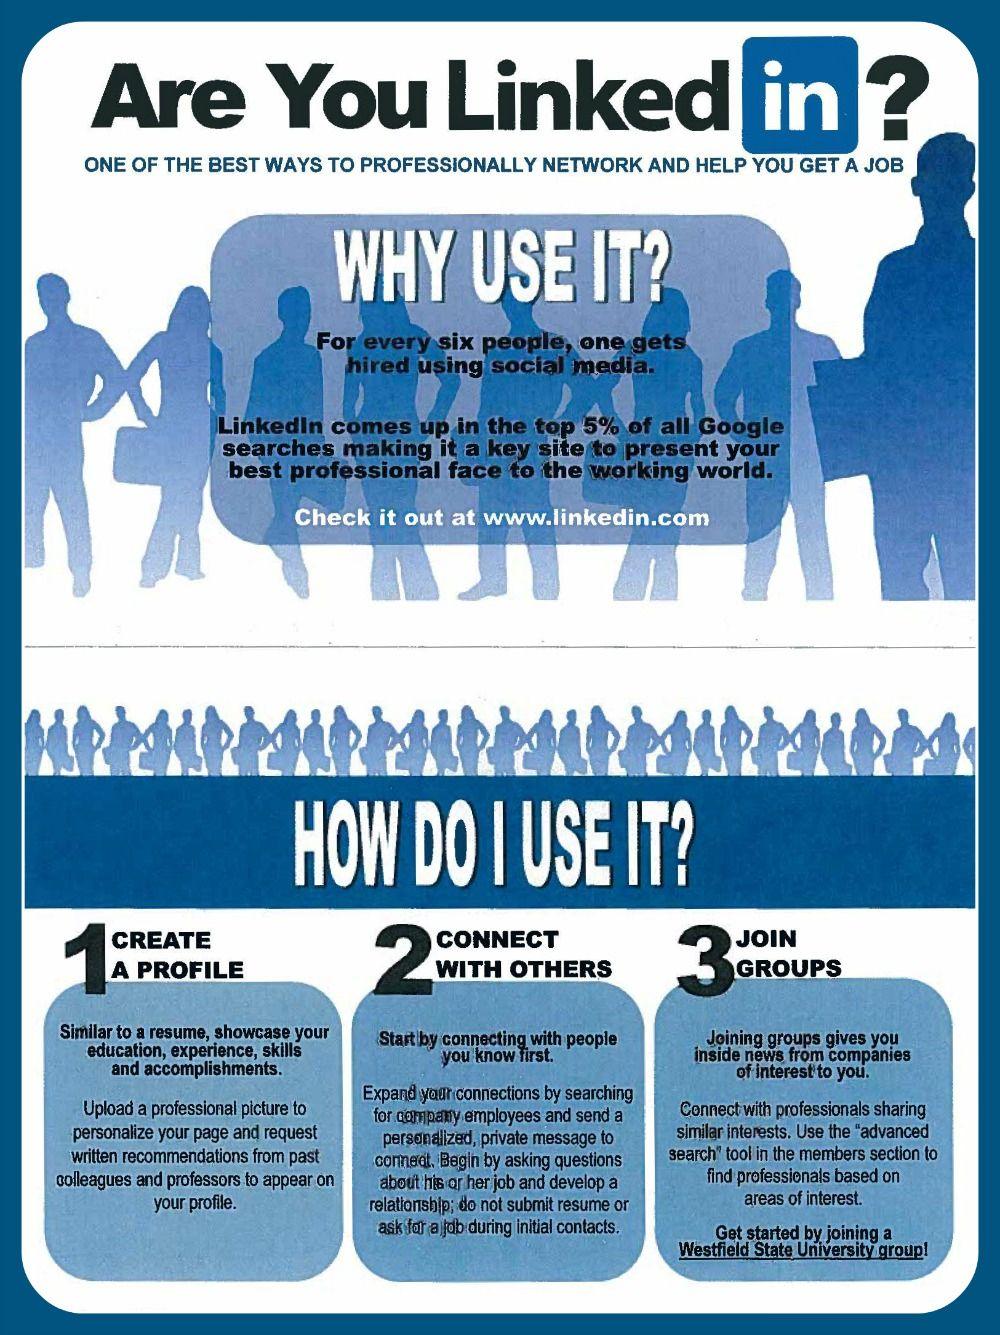 Are You LinkedIn? Social media, Job search tips, Social